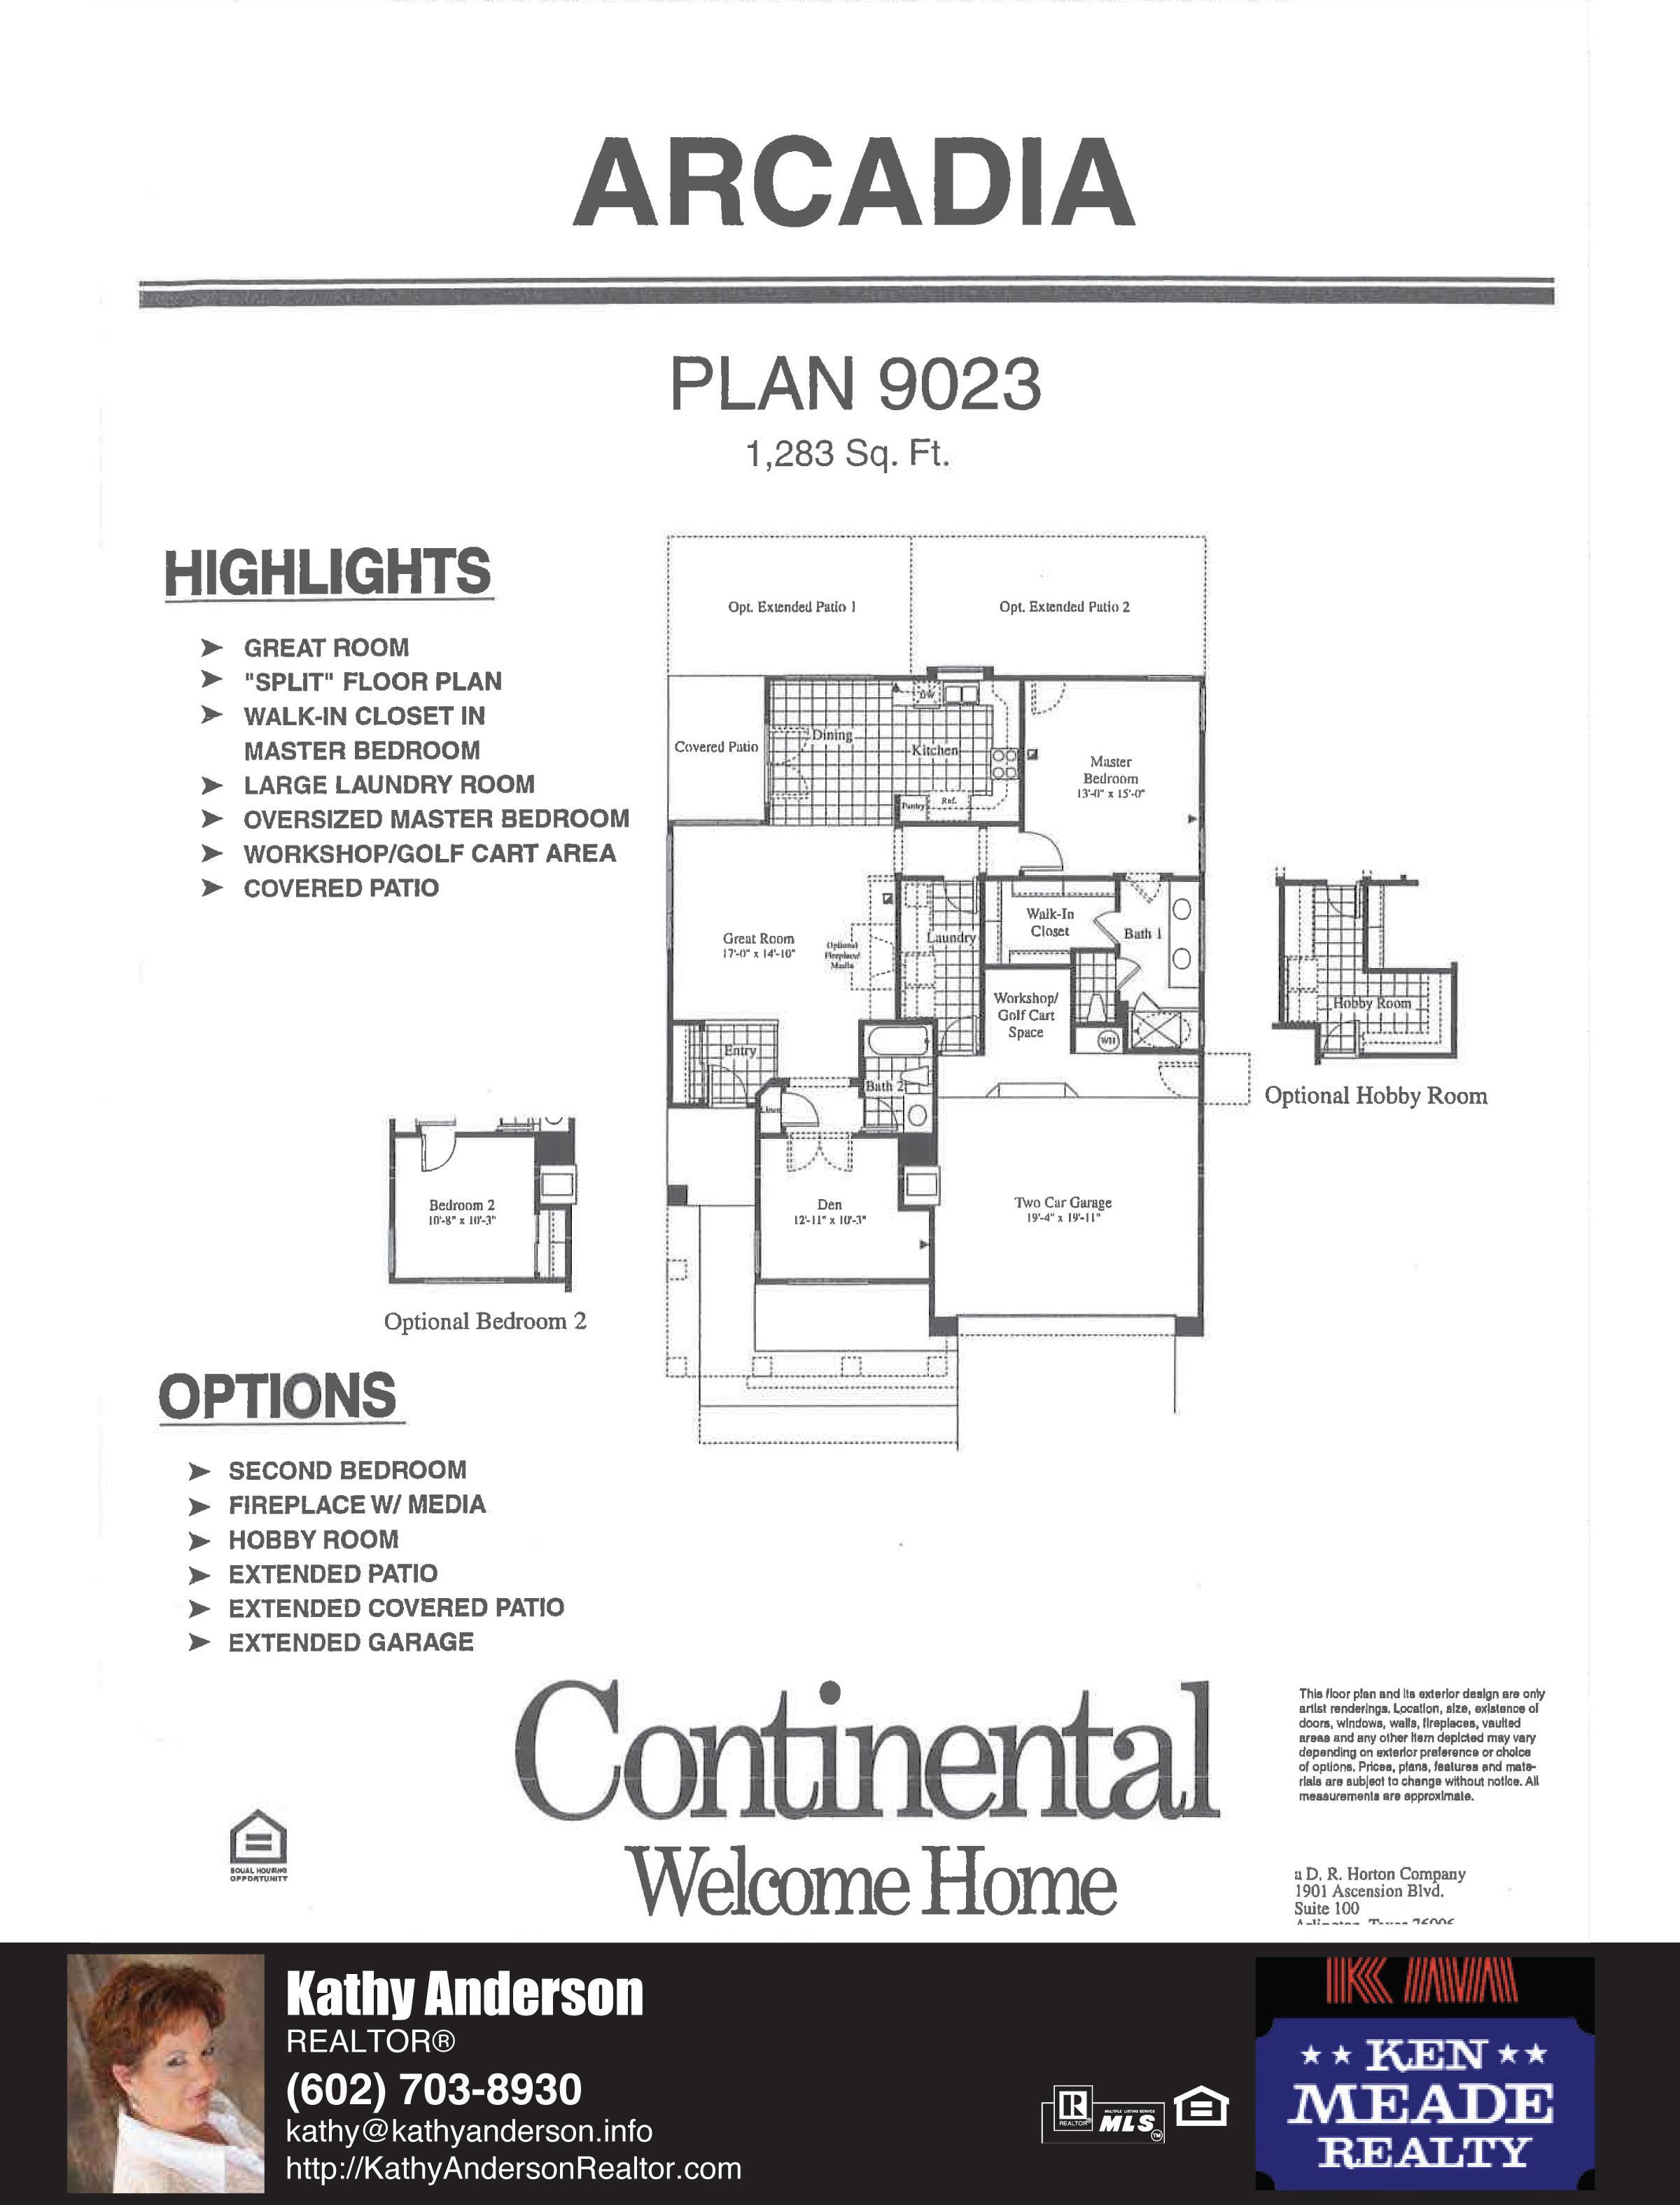 Arizona Traditions Arcadia Floor Plan Model Home Plans Floorplans Models in Surprise Arizona AZ Top Ken Meade Realty Realtor agent Kathy Anderson